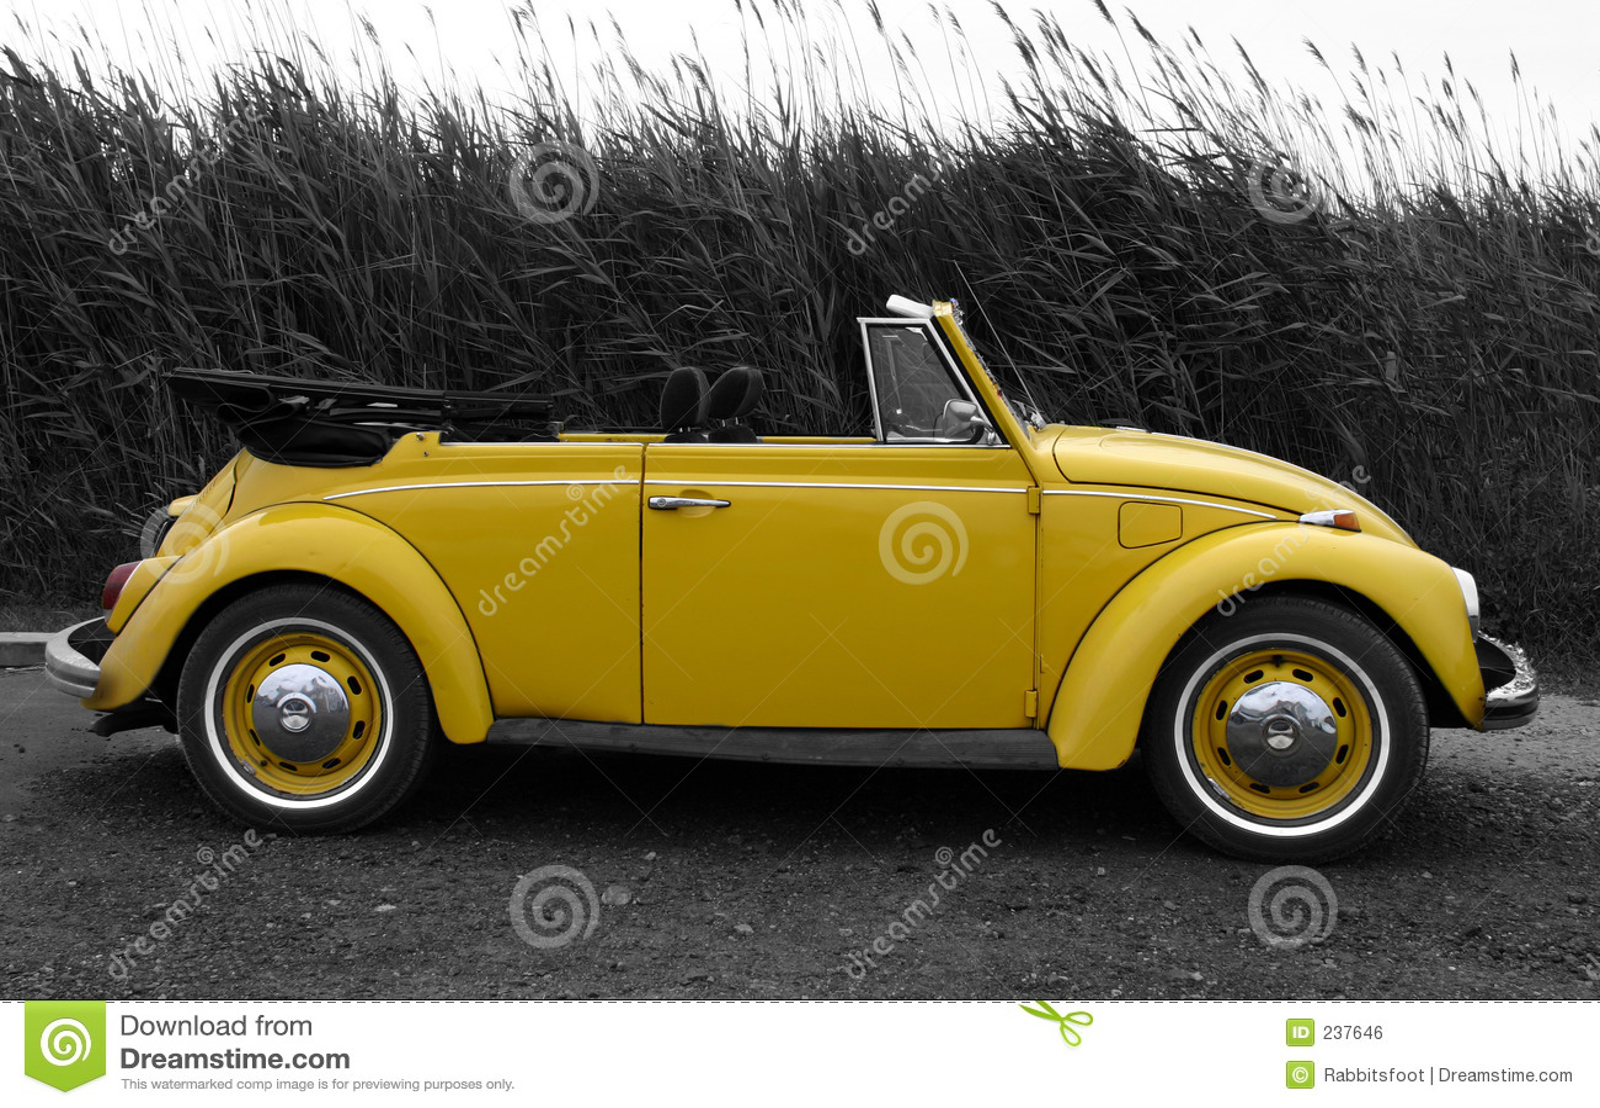 Yellow VW Royalty Free Stock Image - Image: 237646